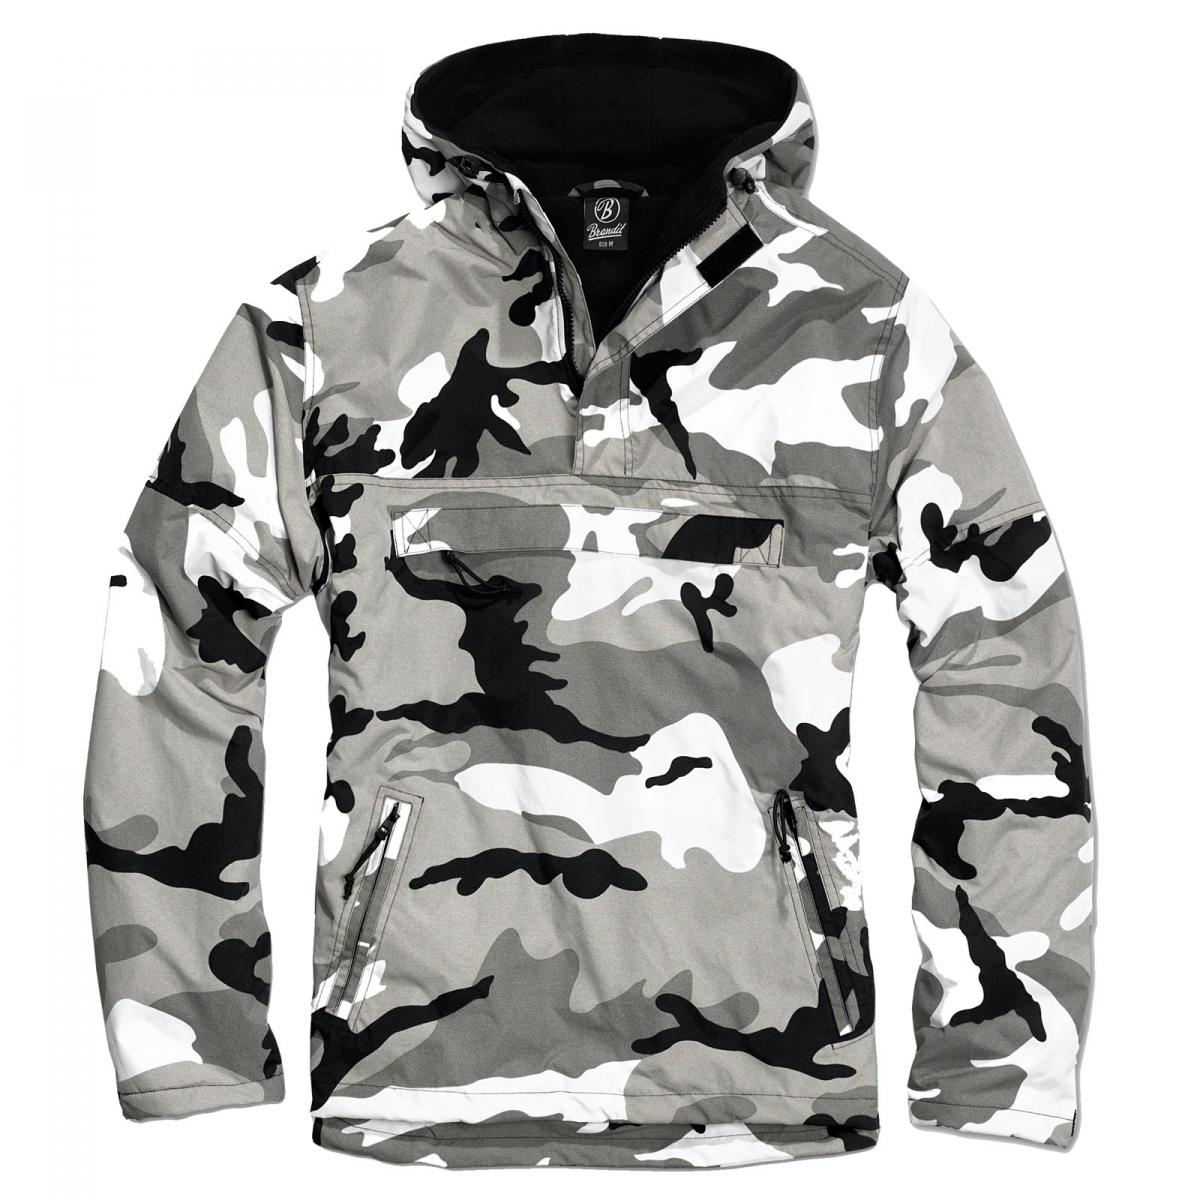 veste ski camouflage homme,veste ski camouflage homme,veste ski camouflage homme,veste ski camouflage homme